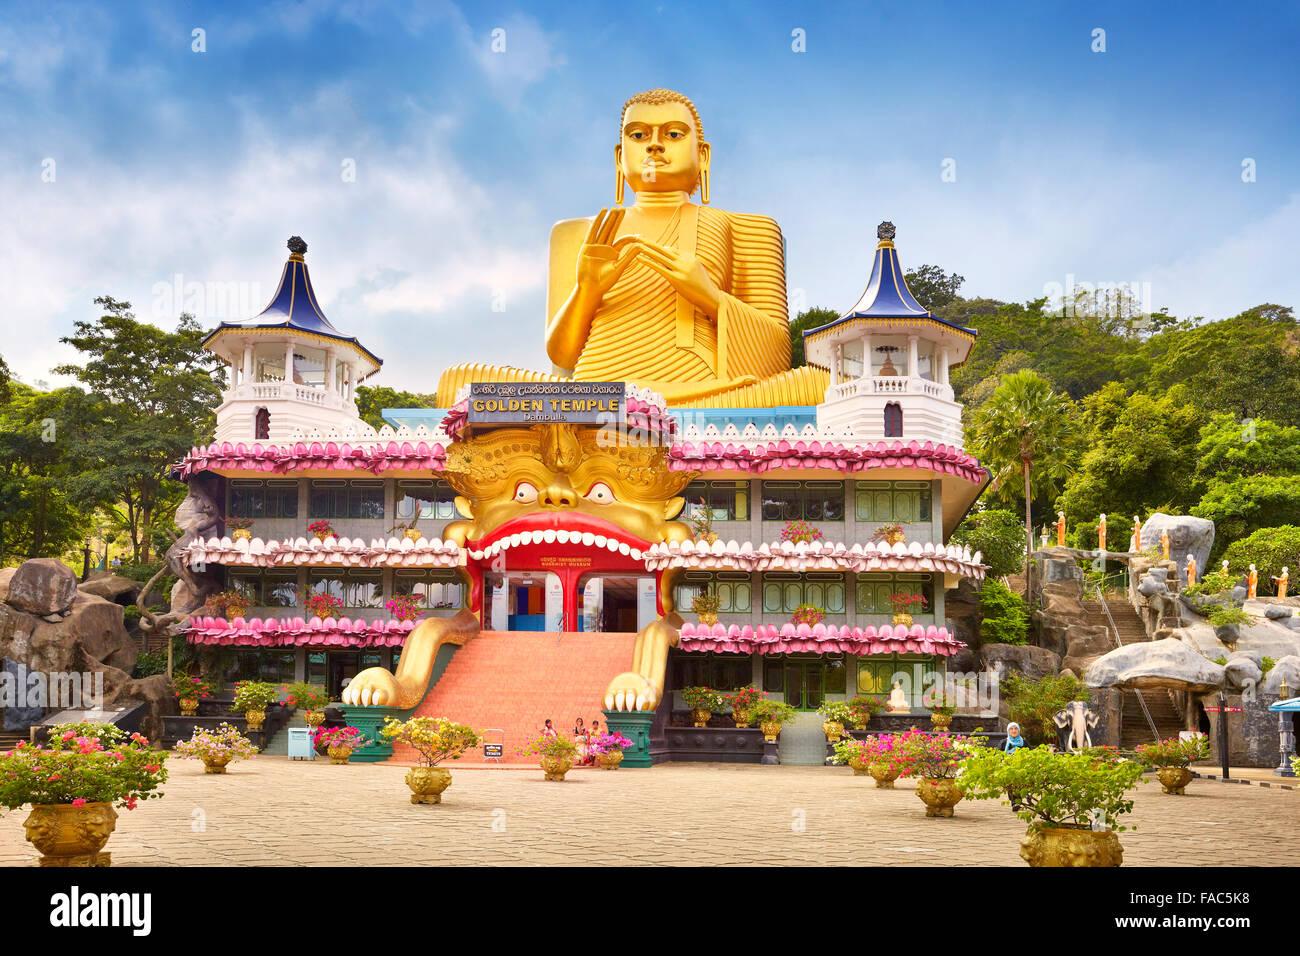 Sri Lanka - Dambulla, Golden Buddha statue over the Buddish Museum, UNESCO World Heritage Site - Stock Image